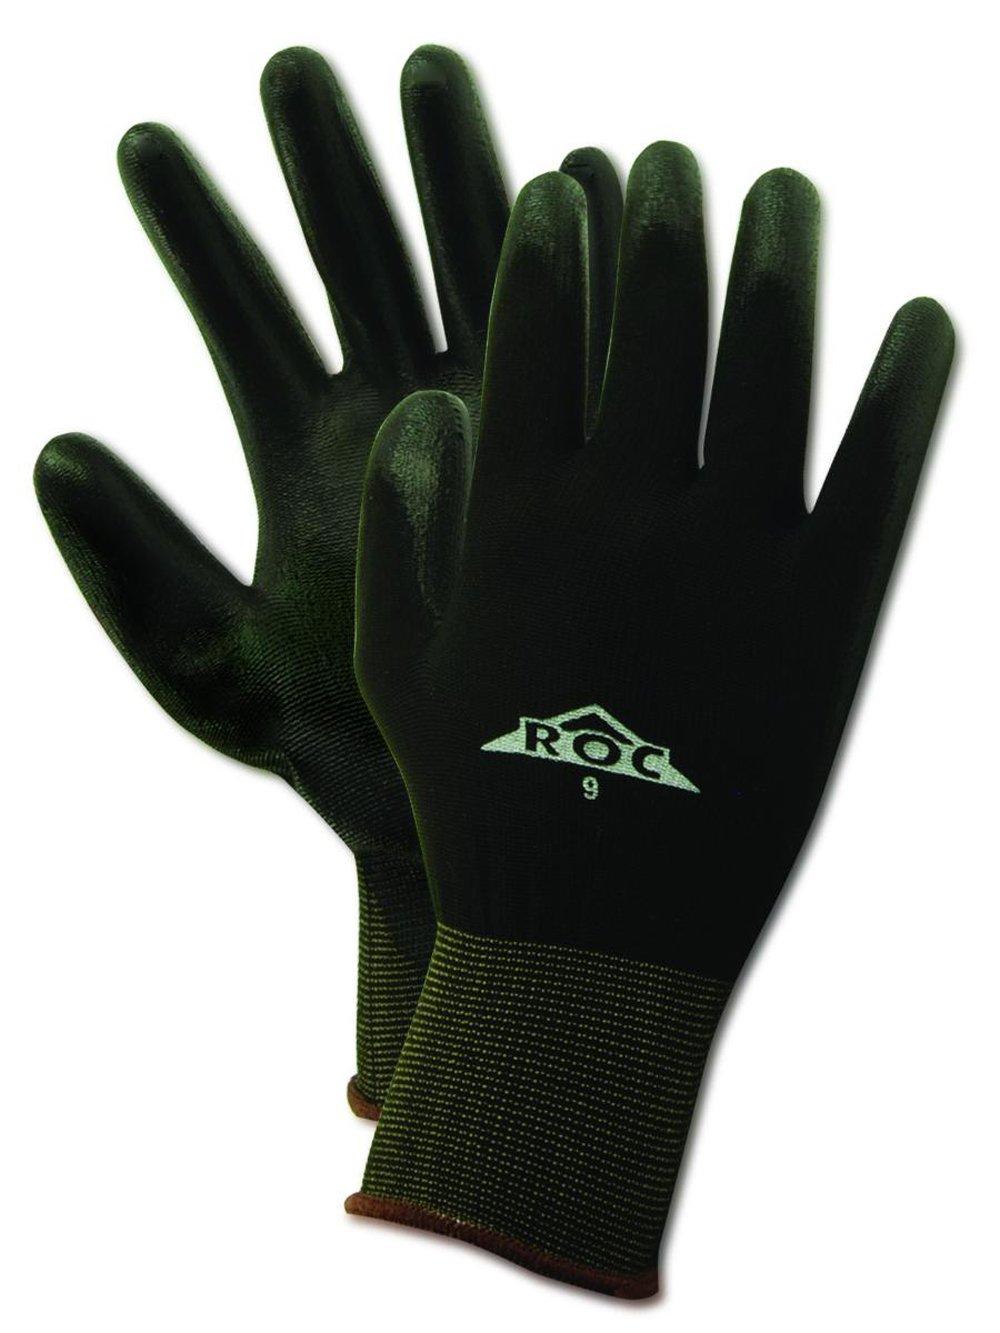 "MAGID ROC BP170 Nylon Glove, Black Polyurethane Palm Coating, Knit Wrist Cuff, 8"" Length, Size 7 (12 Pair)"